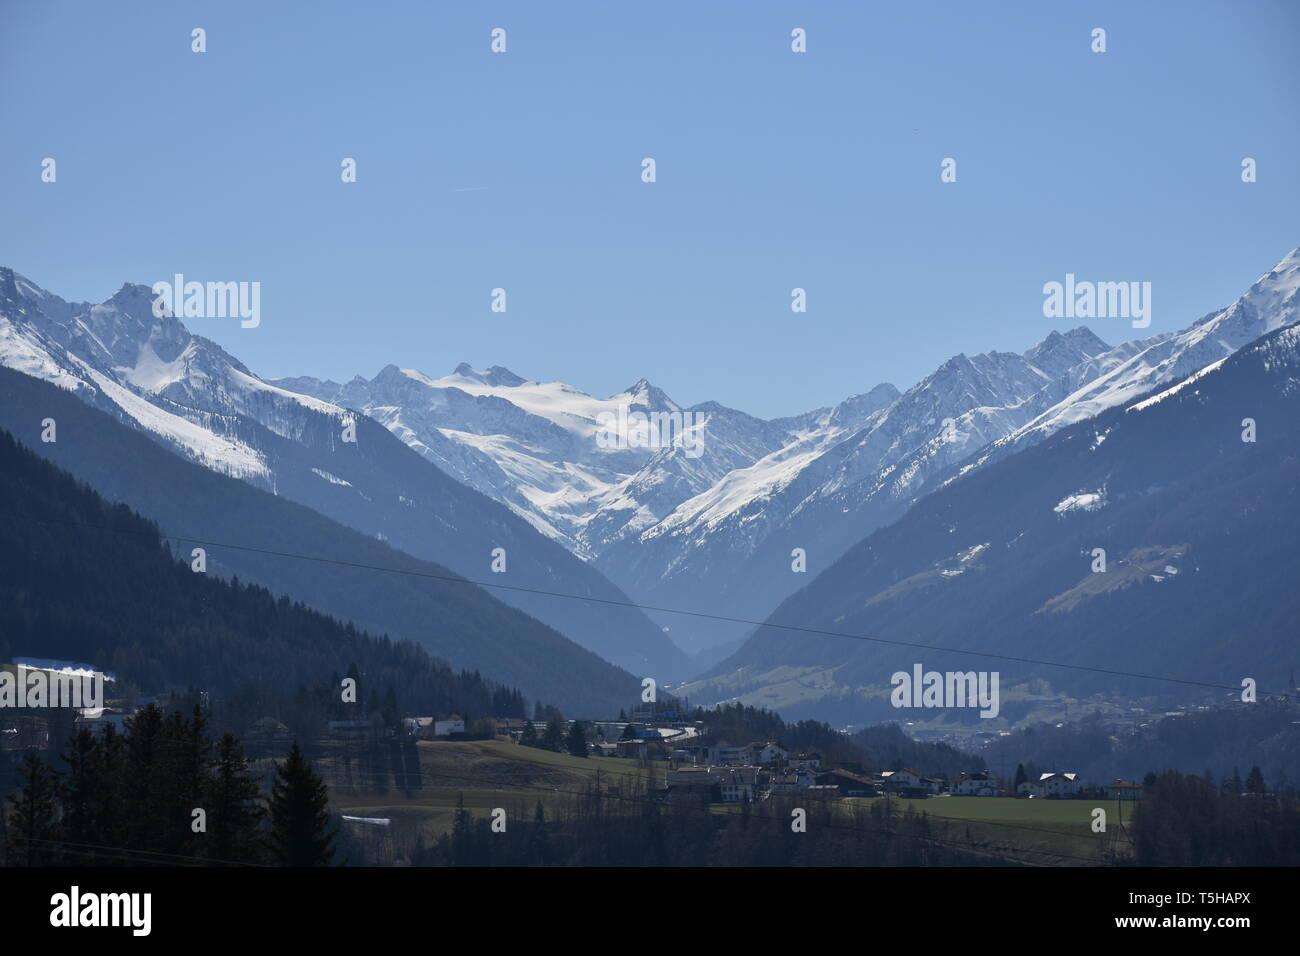 Wipptal, Inntal, Brenner, Brennerpass, Wipptalterrasse, Landstraße, Bergstraße, Nebenstraße, Straße, Asphalt, Nordtirol, Tirol, Österreich, Innsbruck, - Stock Image